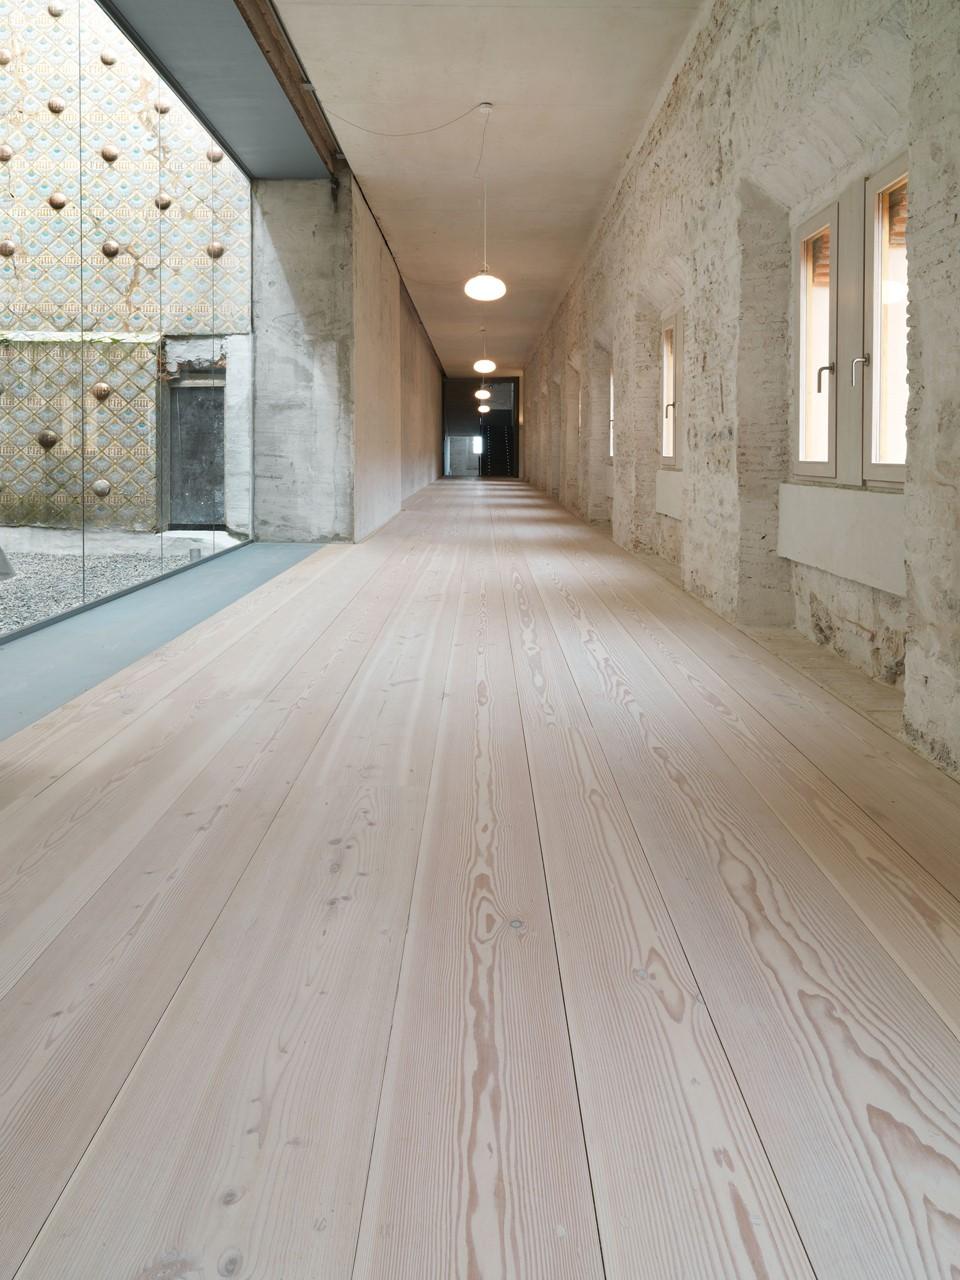 douglas-plank-floor-restoration_lye-white-soap_comillas-university-spain_dinesen.jpg